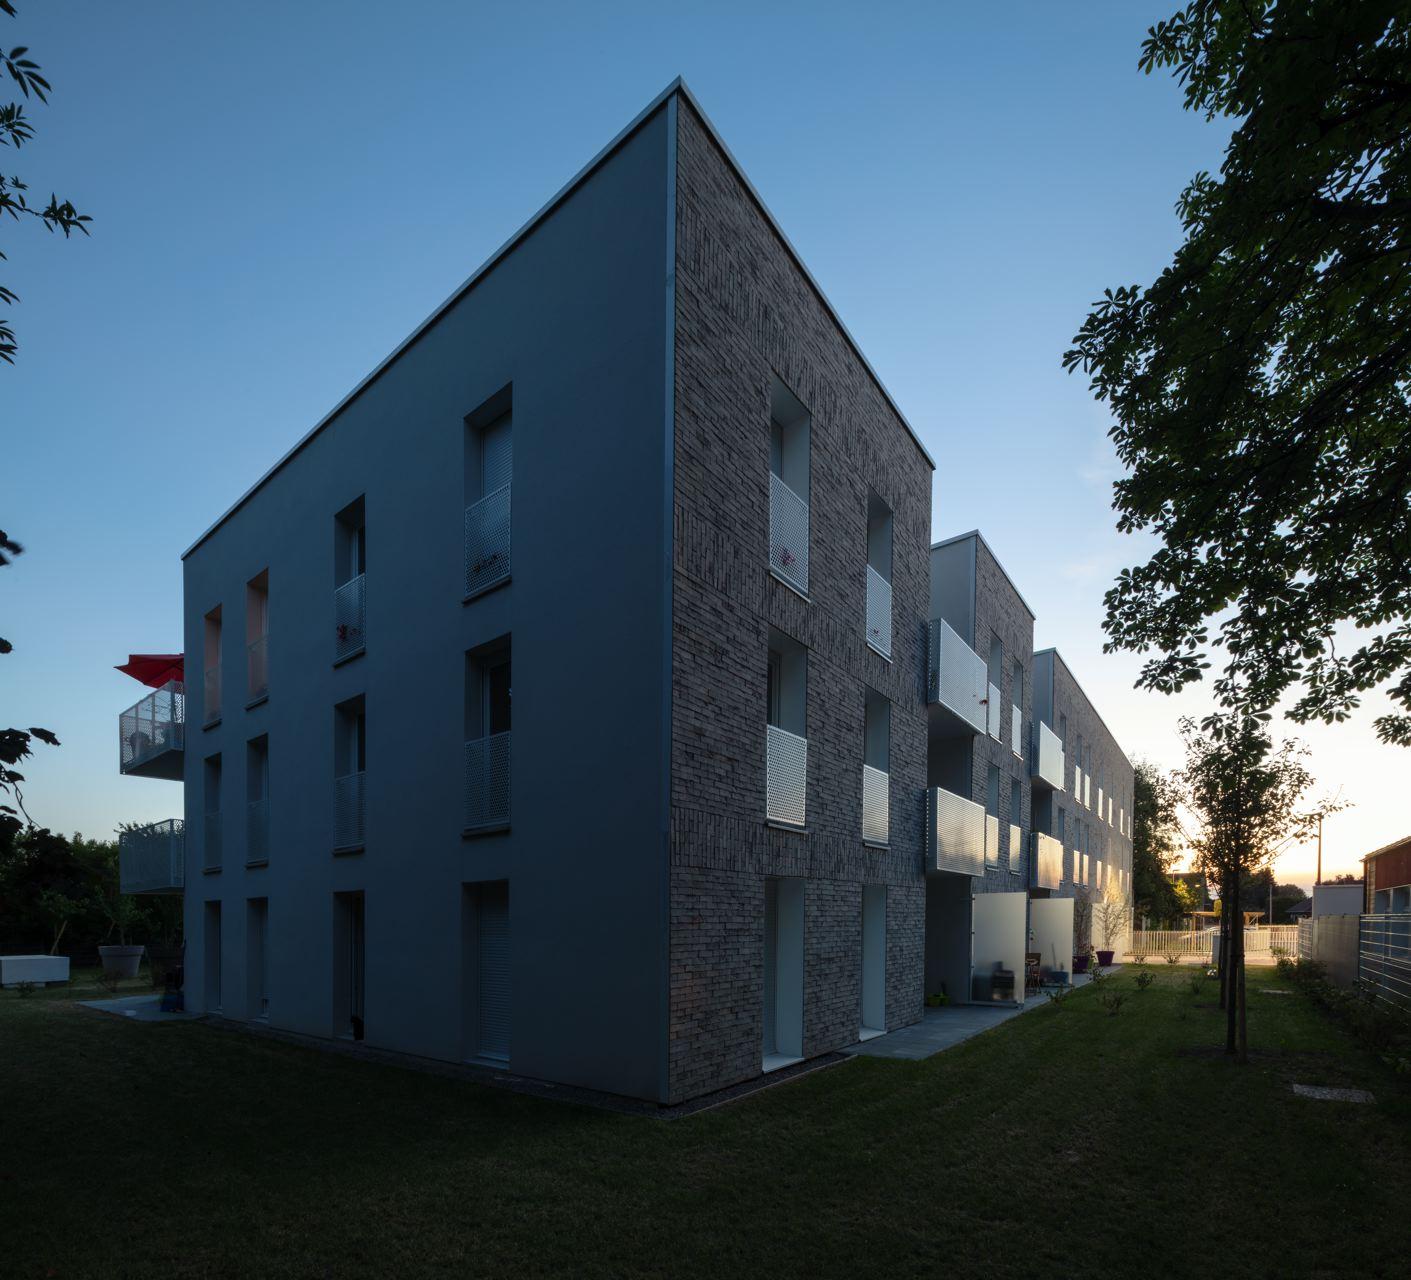 LDKphoto - Rue Henri Barbuse - Fache Thumesnil - 45.jpg